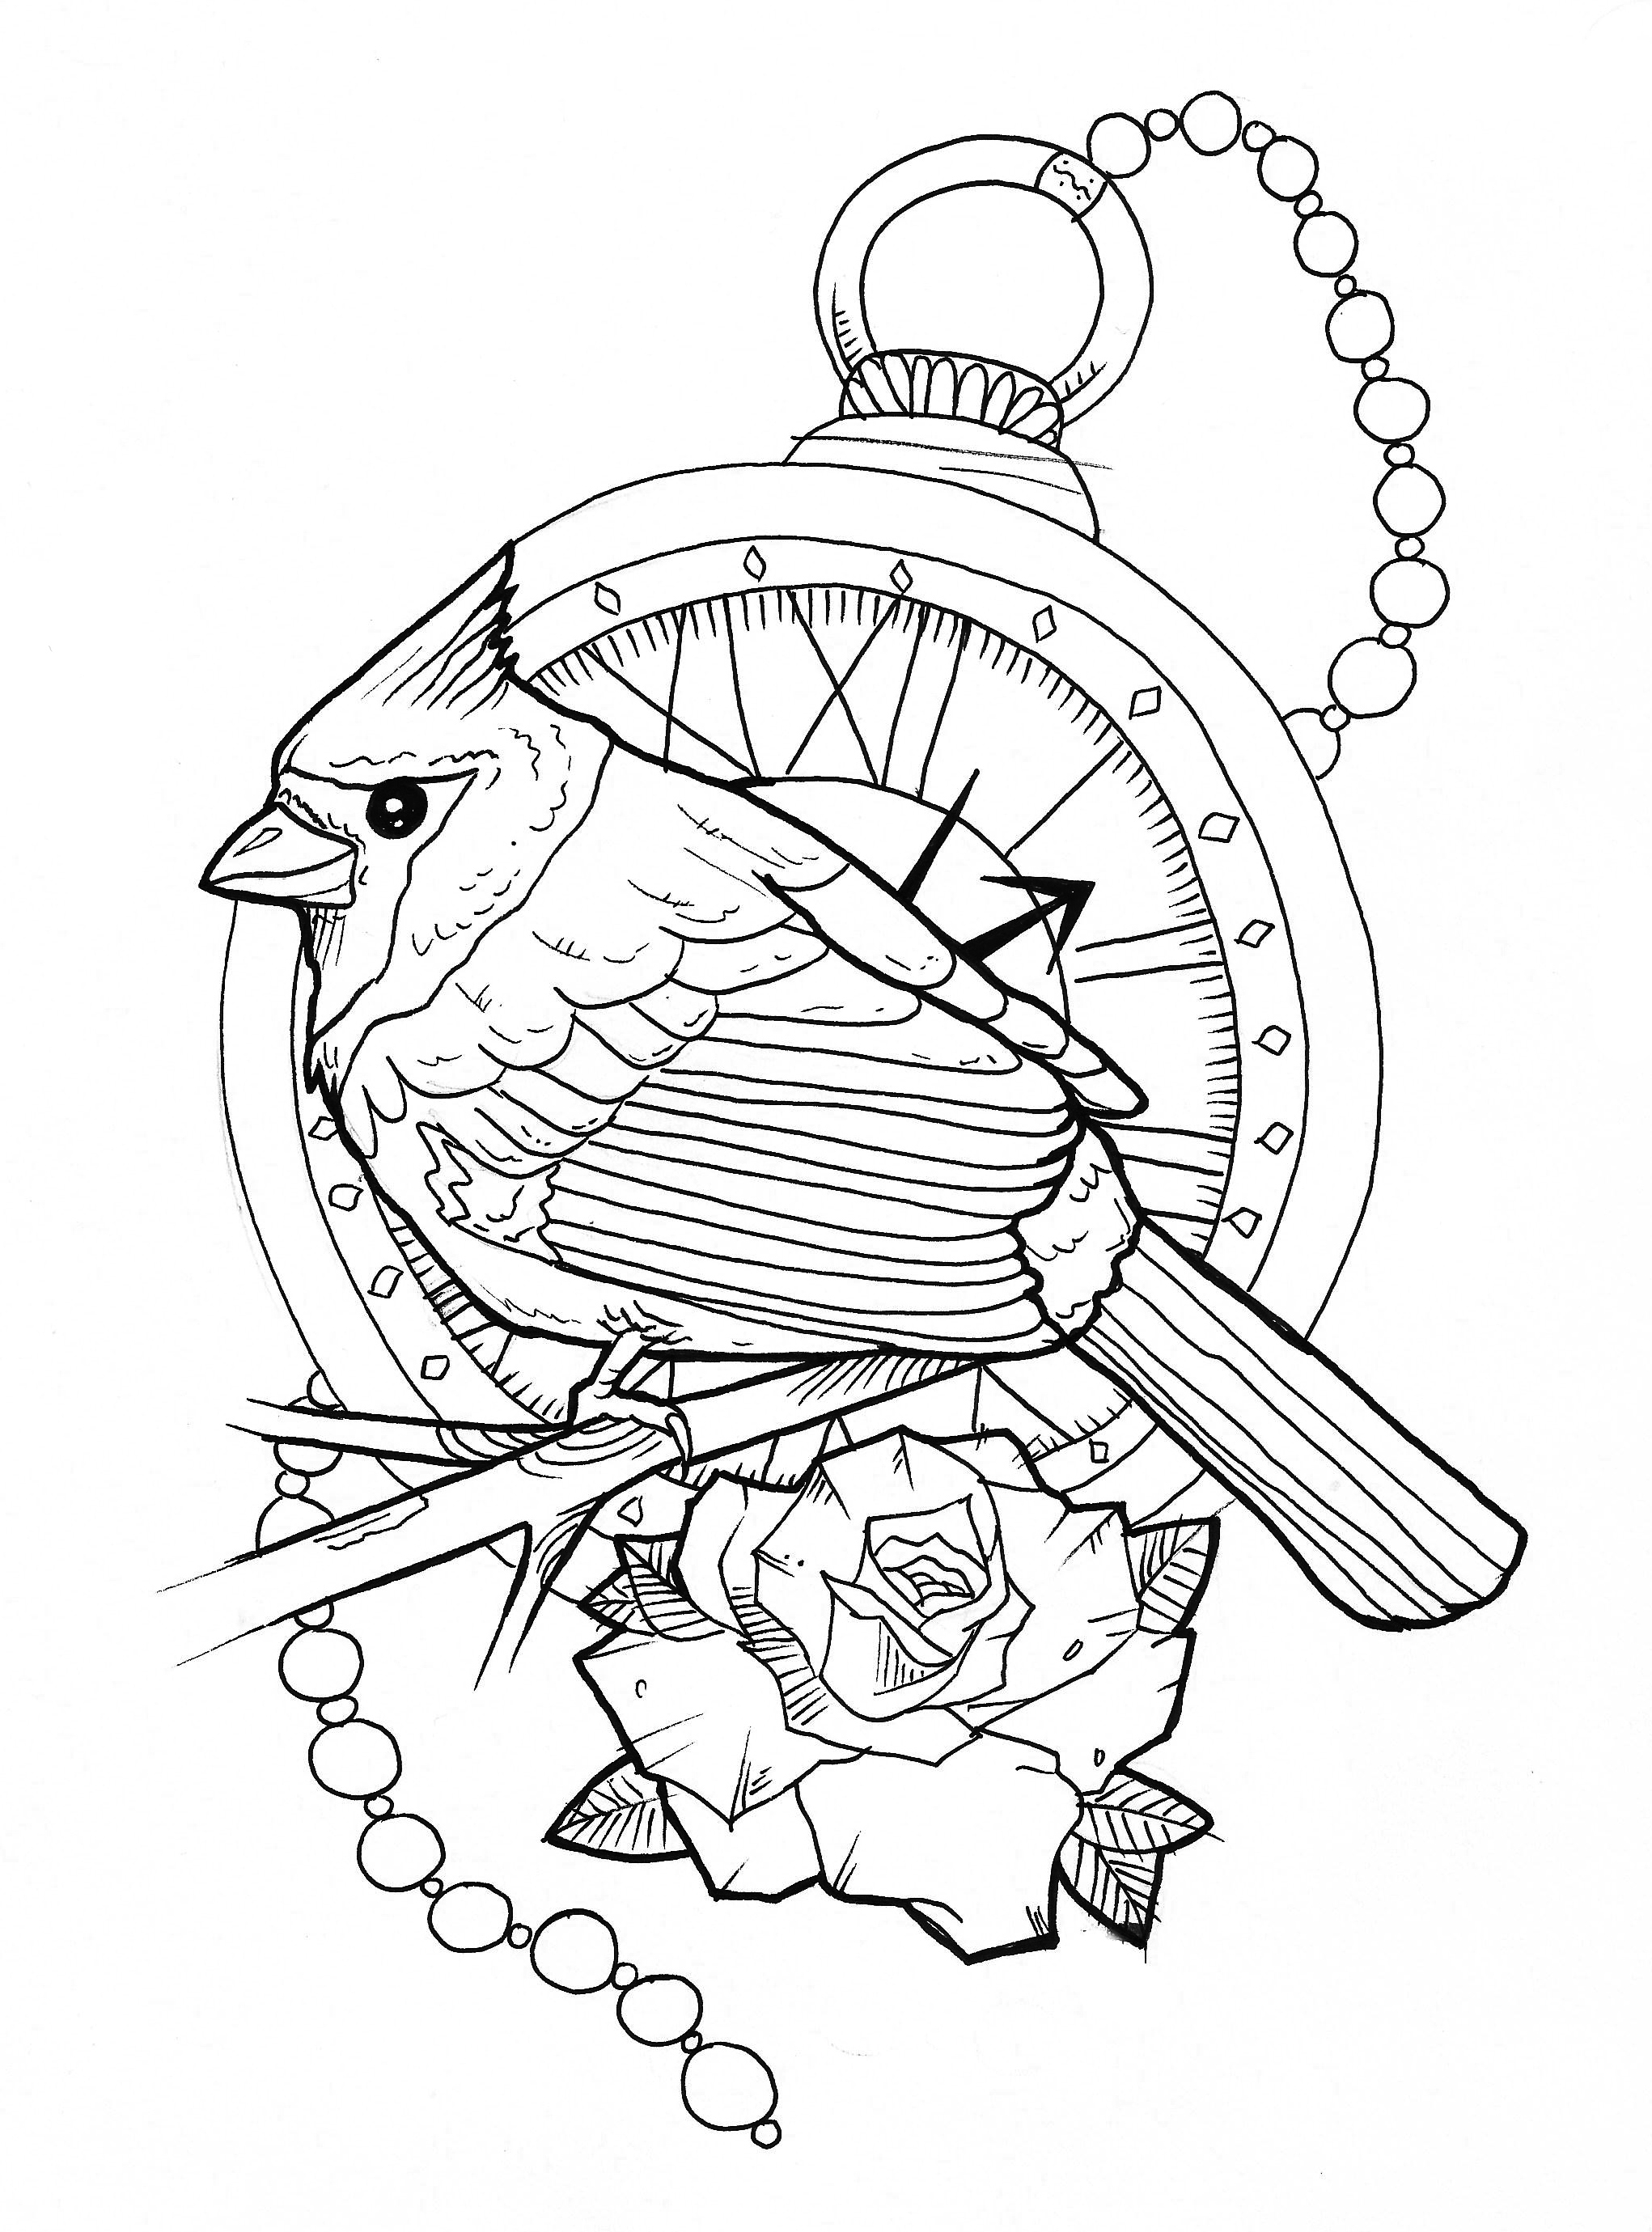 Bird Line Drawing Tattoo : Bird tattoo by marymarylp on deviantart